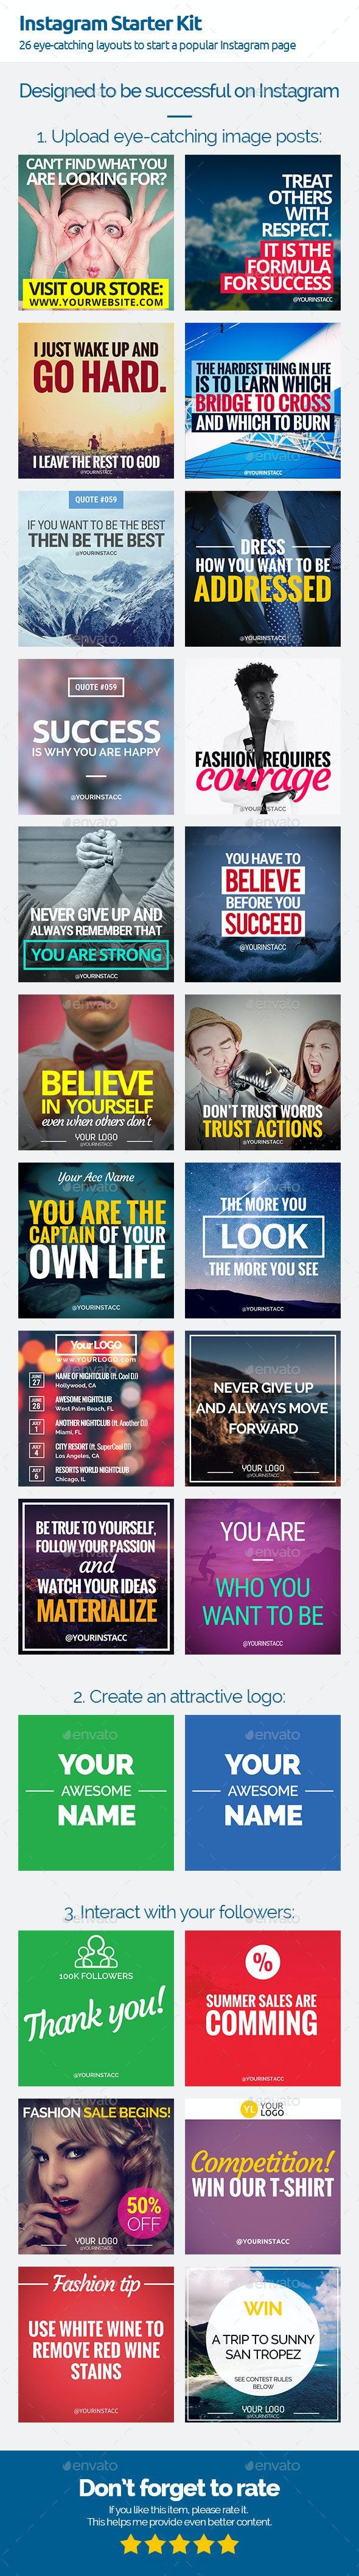 Instagram Starter Kit for Quote Posts - Miscellaneous Social Media